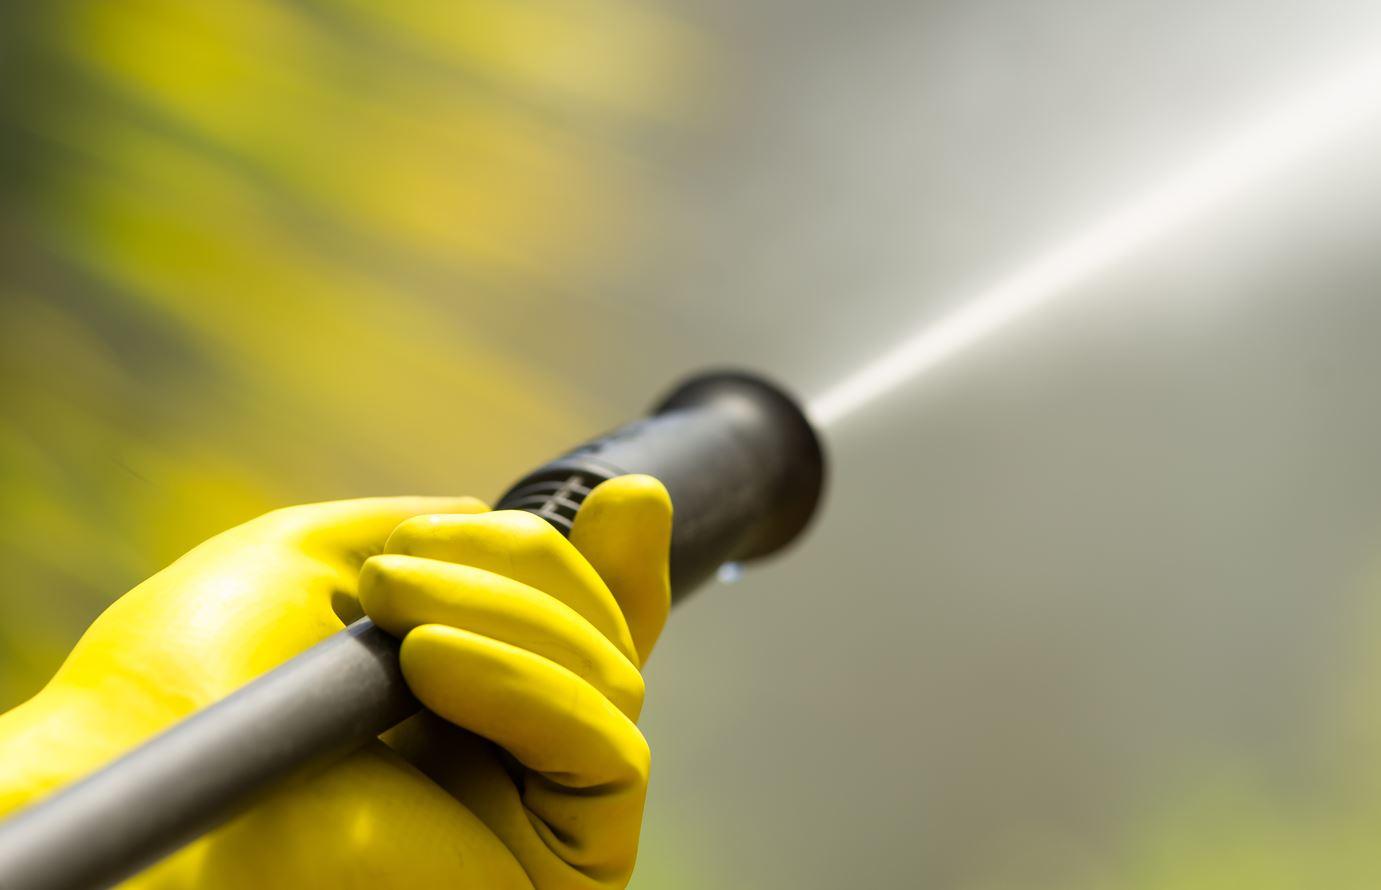 6 Benefits Of Water Blasting